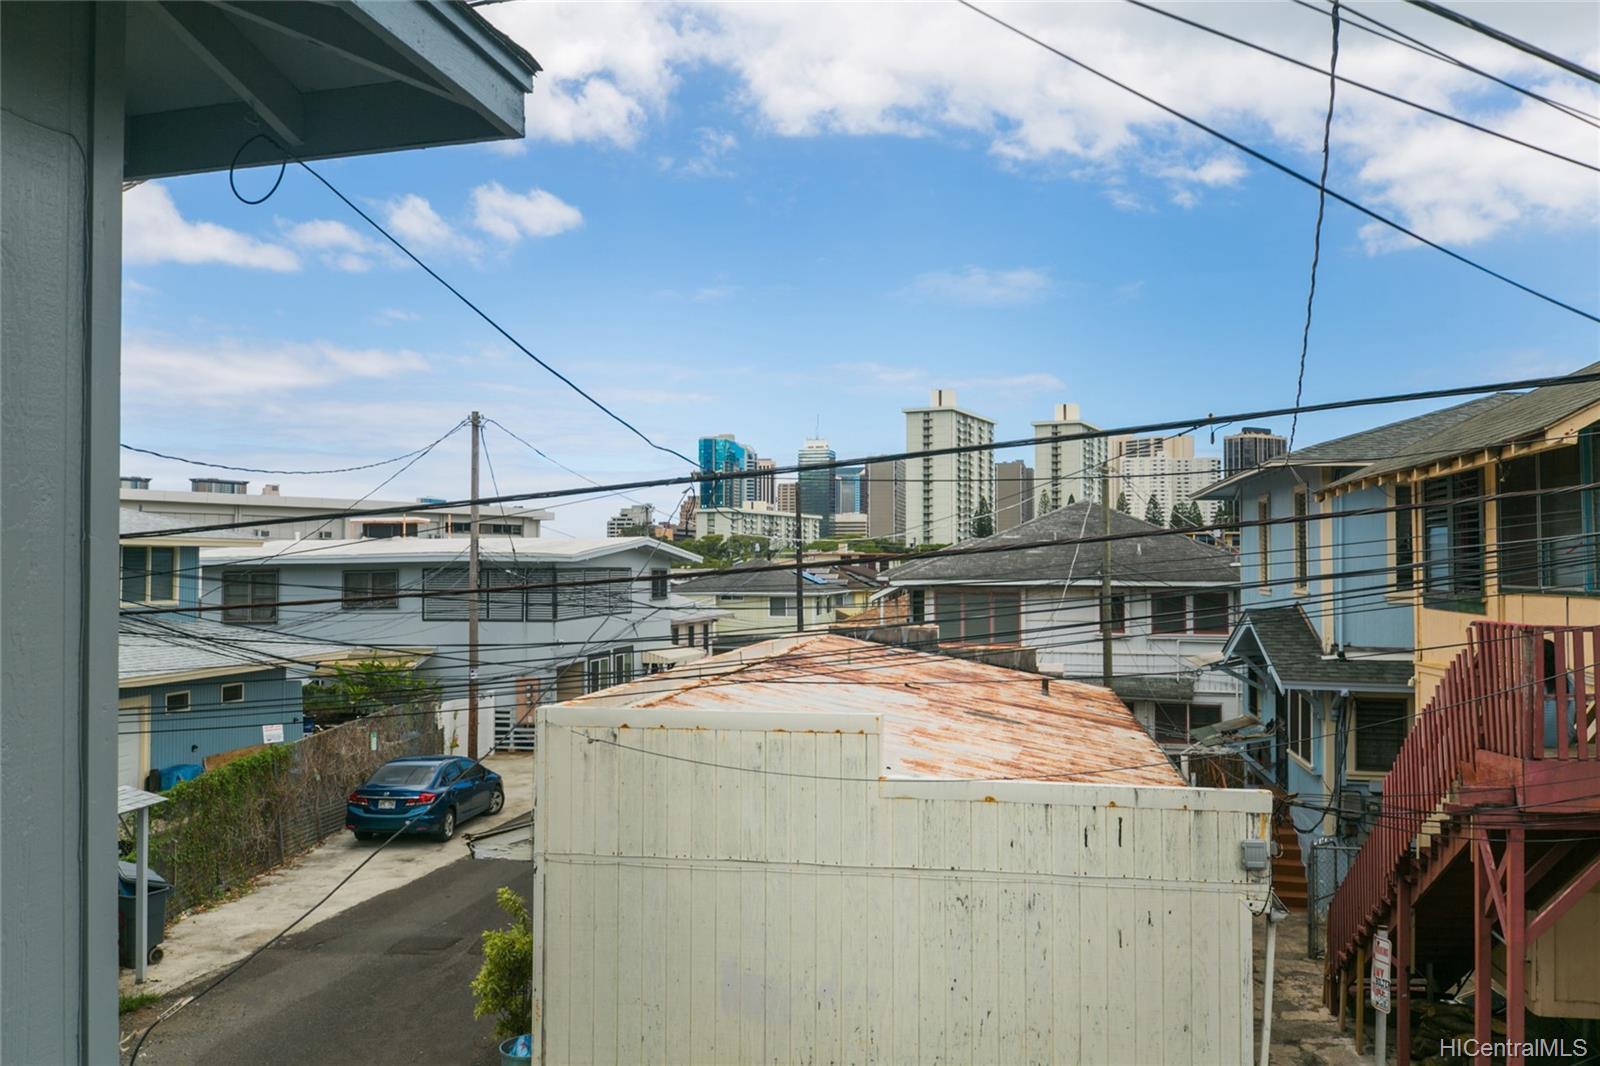 44 Kauila Street Honolulu - Multi-family - photo 6 of 18